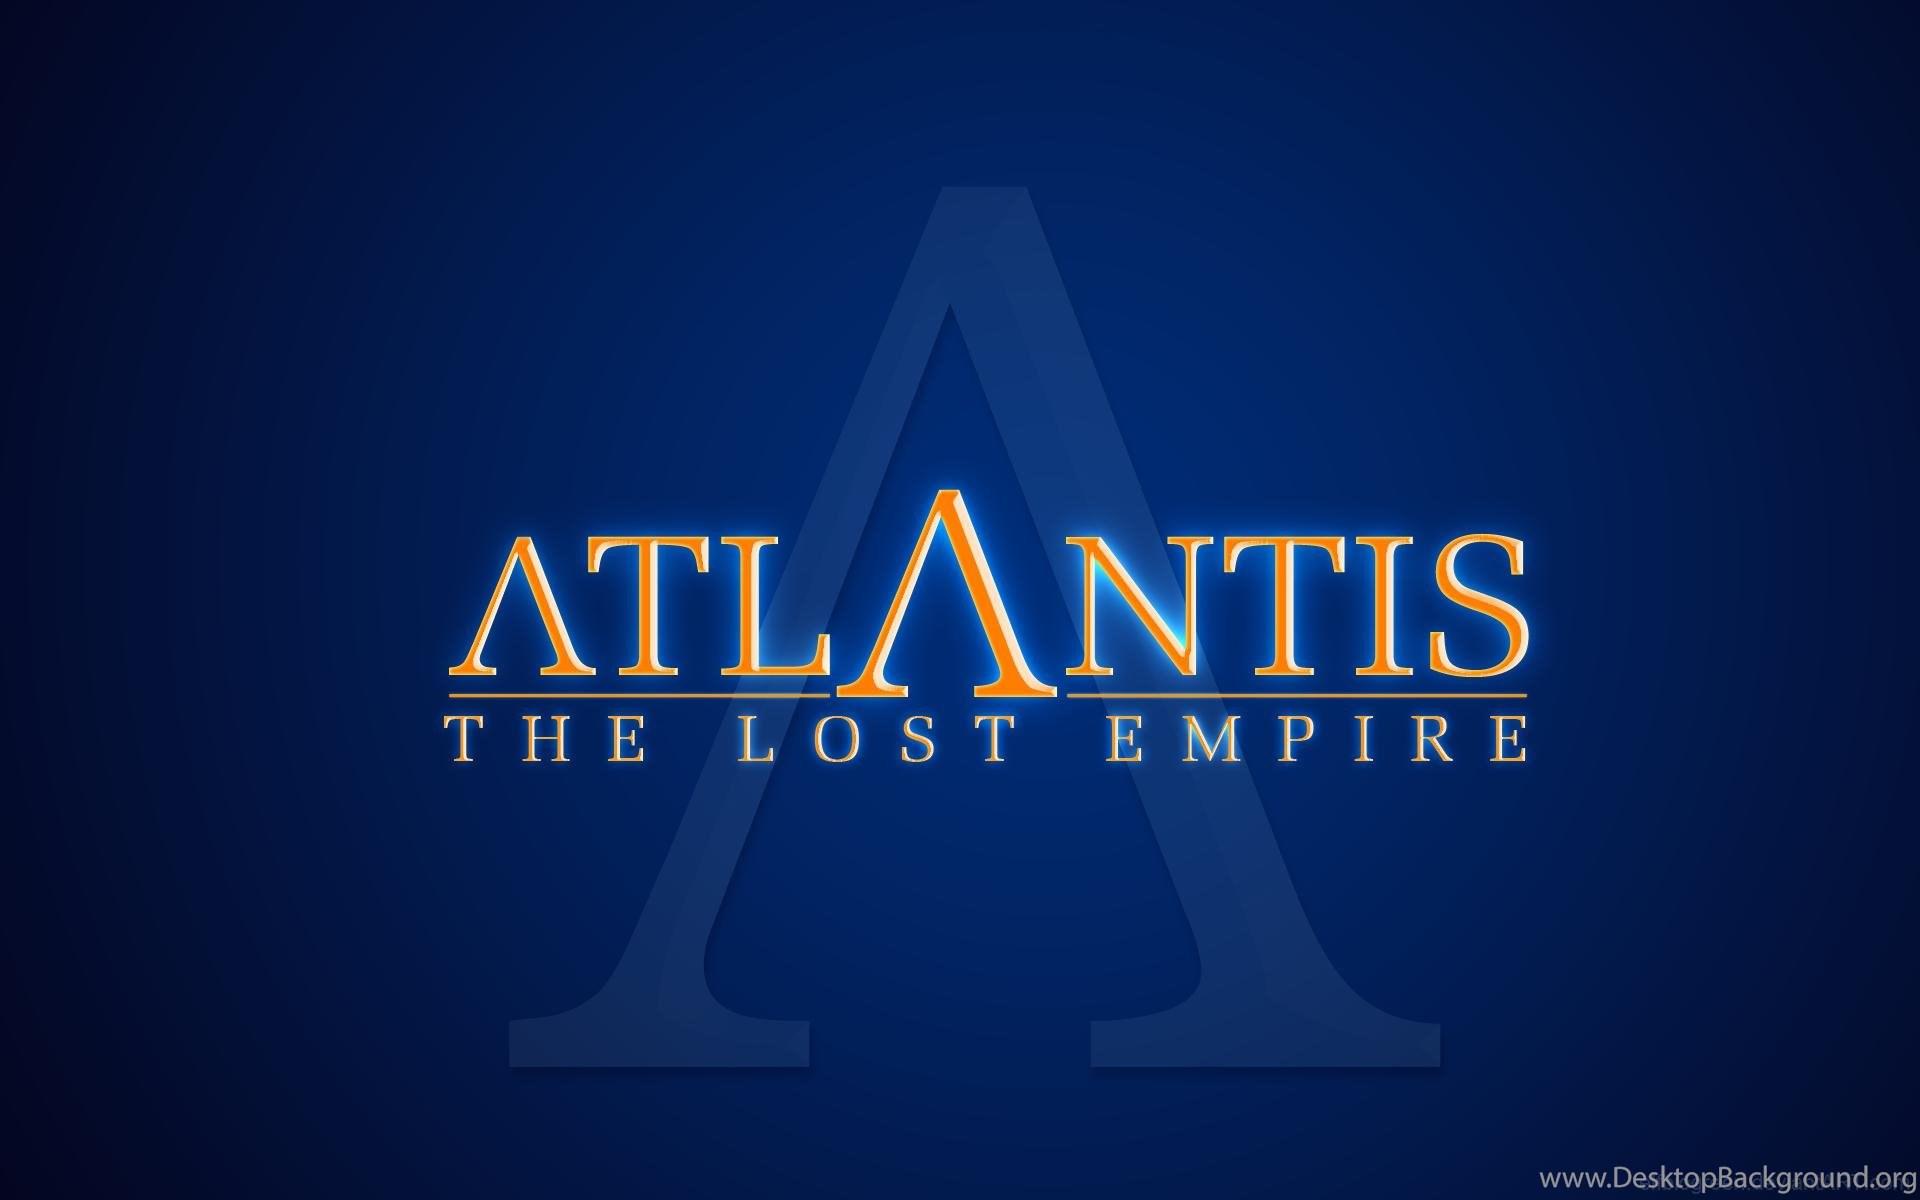 Atlantis The Lost Empire Wallpapers Atlantis Wallpapers 33469522